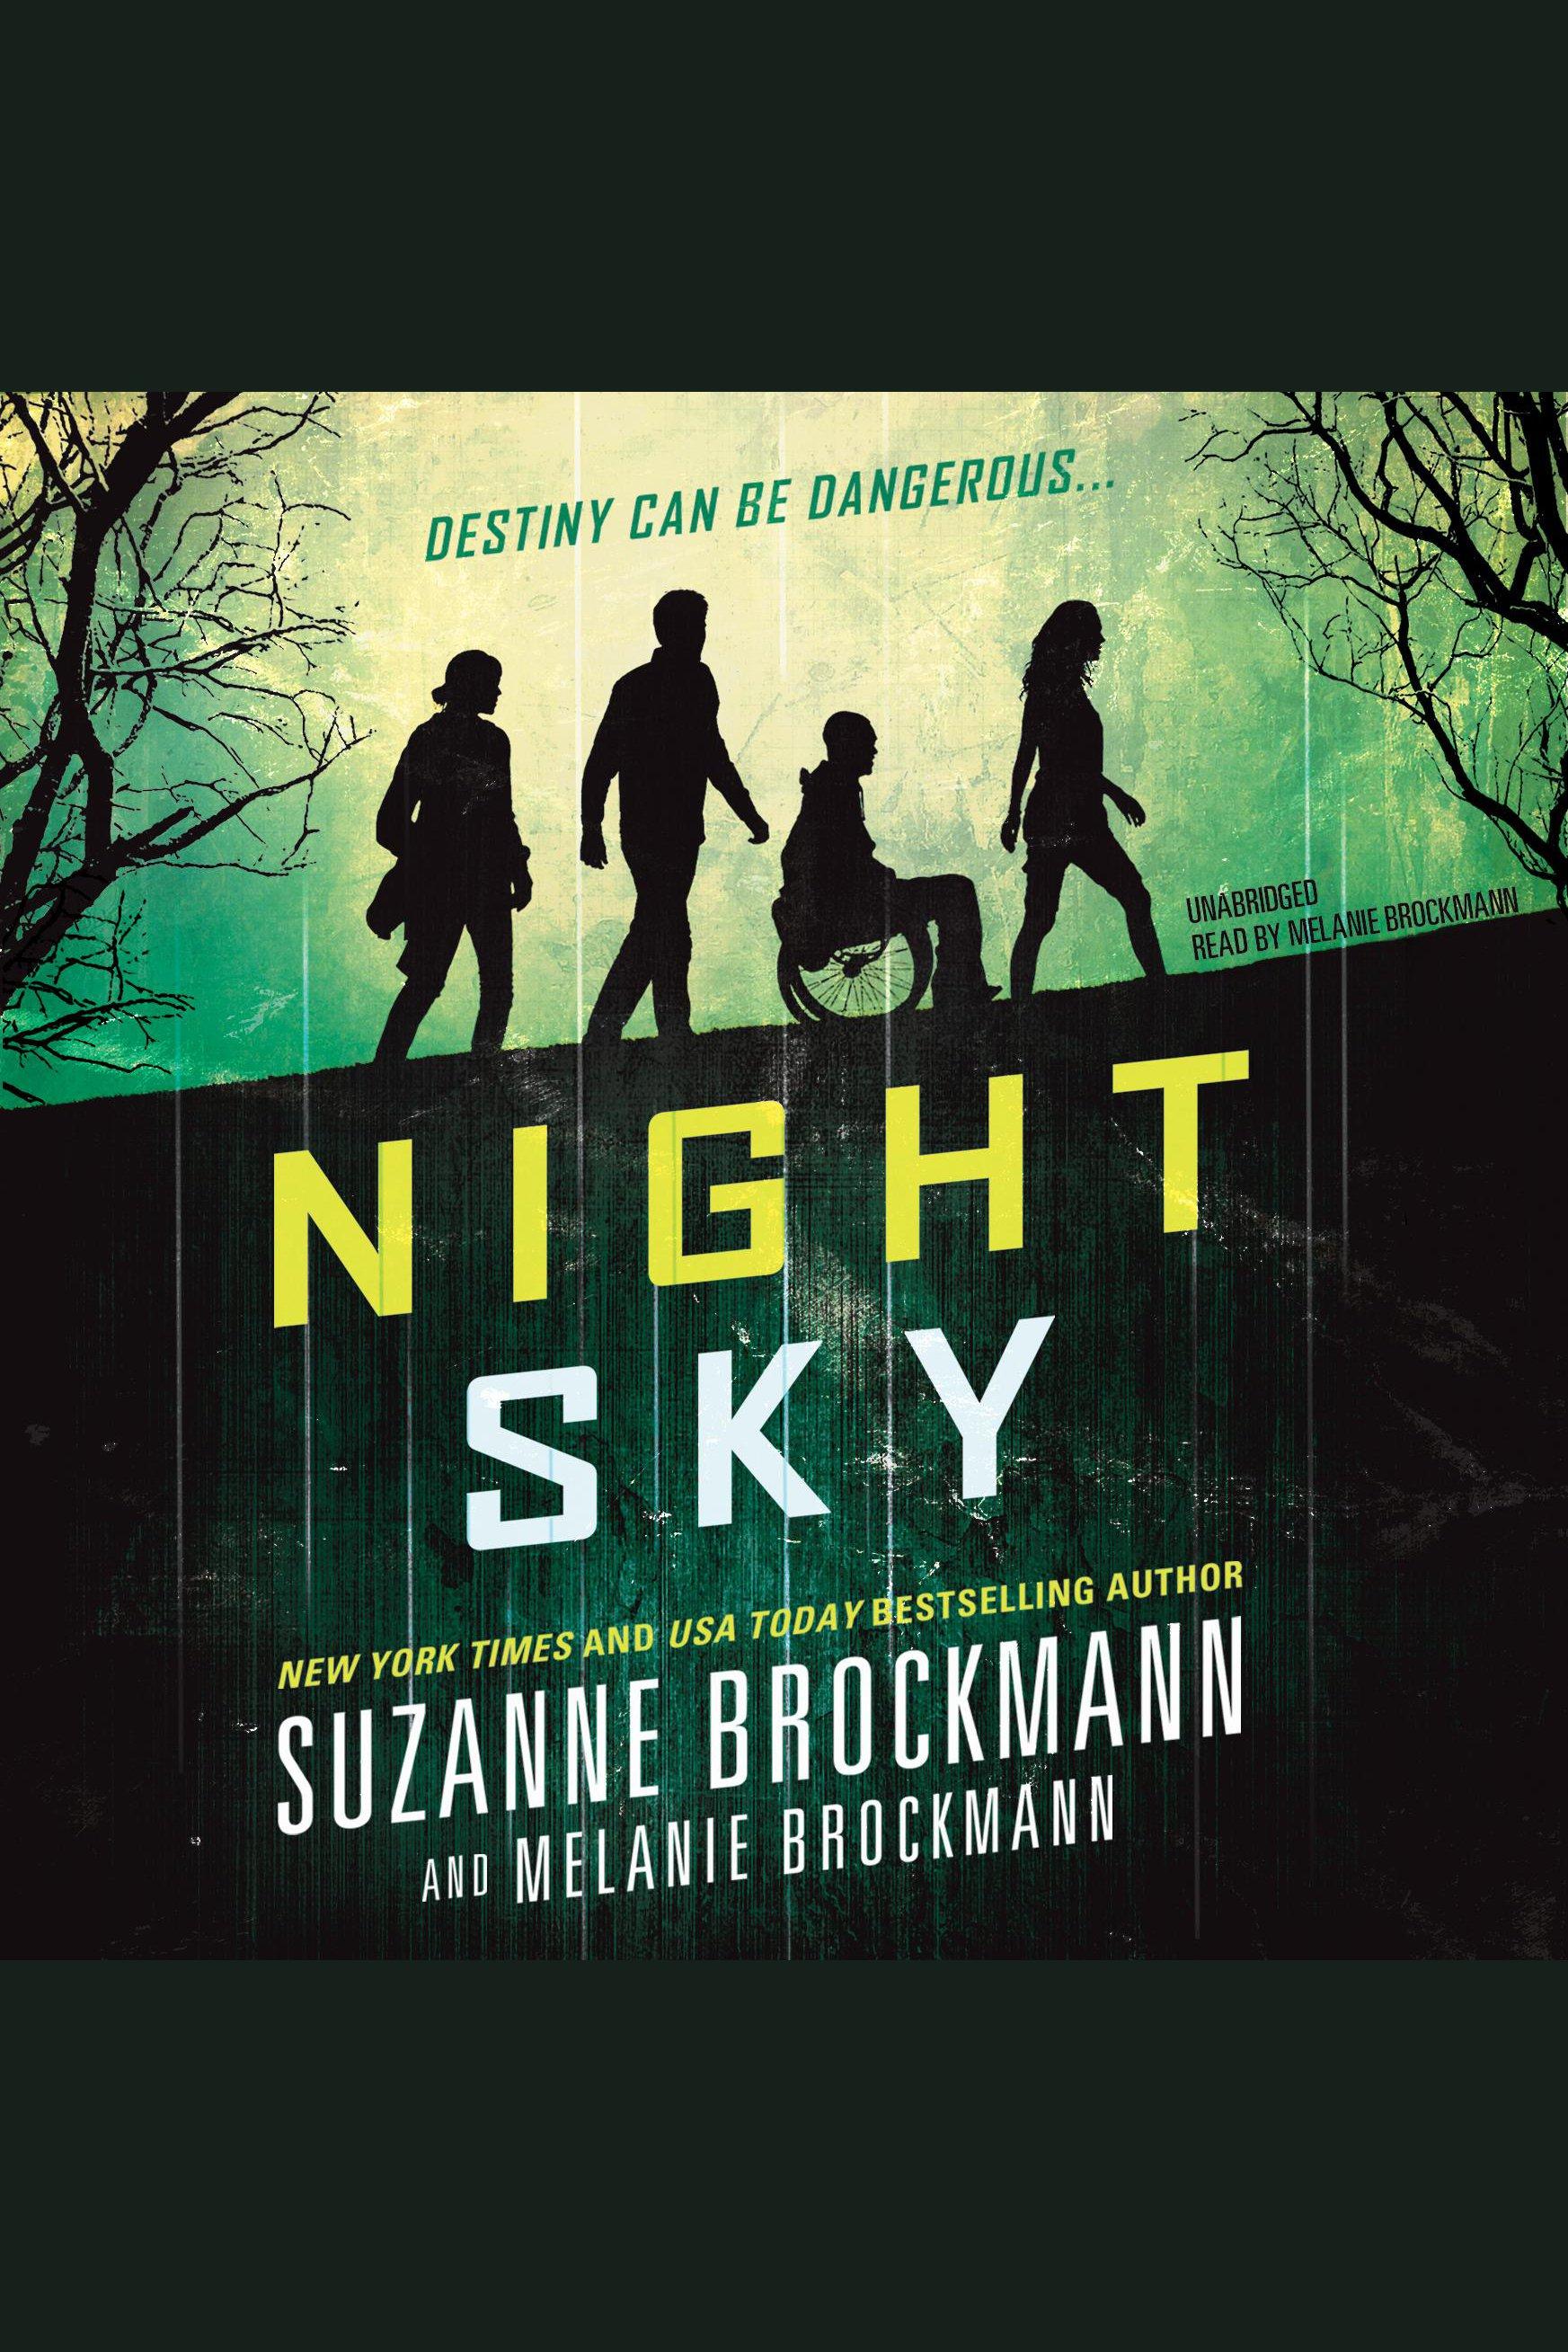 Night sky cover image